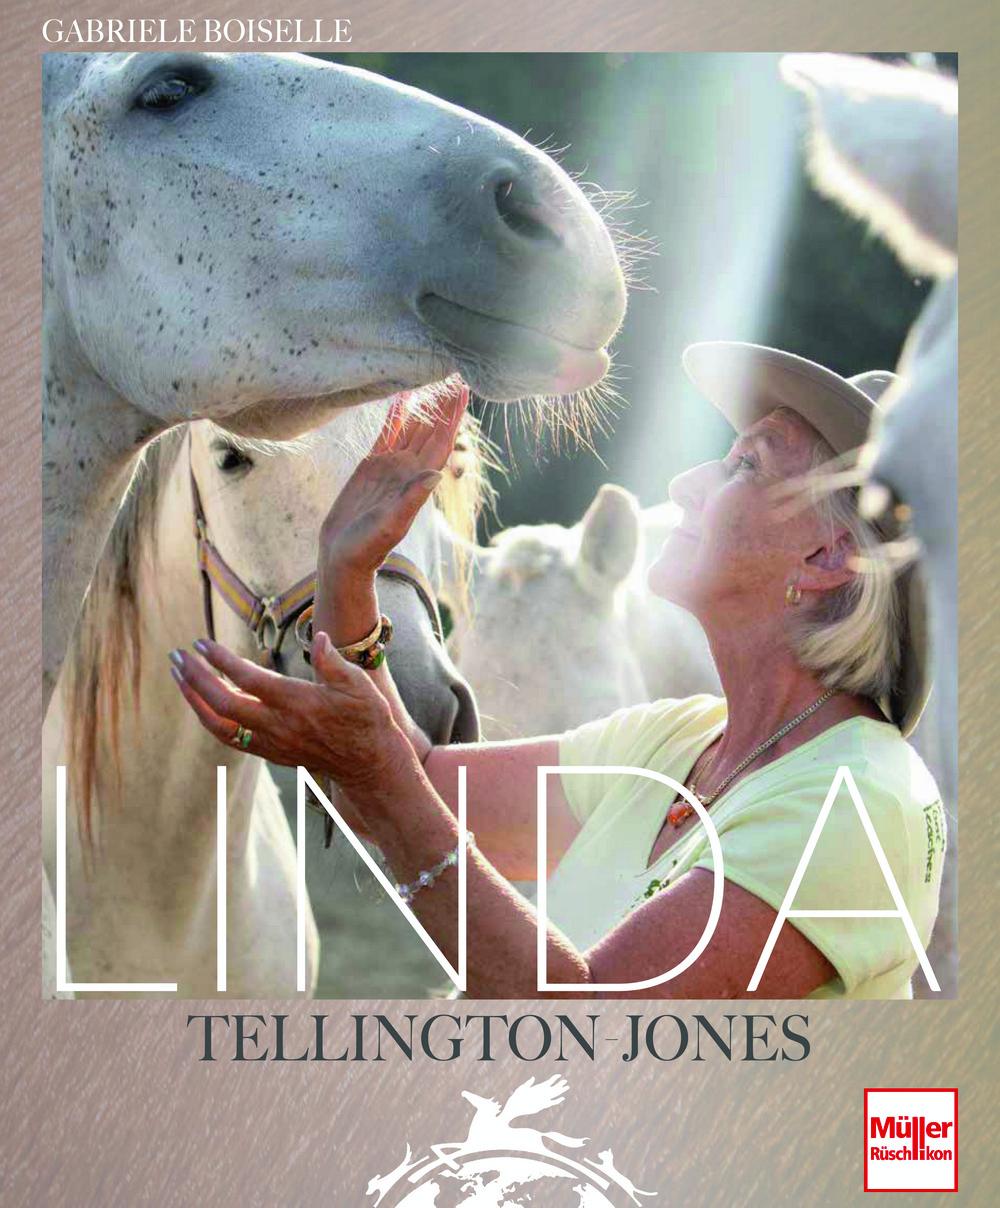 BOISELLE/TELLINGTON-JONES: LINDA Tellington-Jones NEU